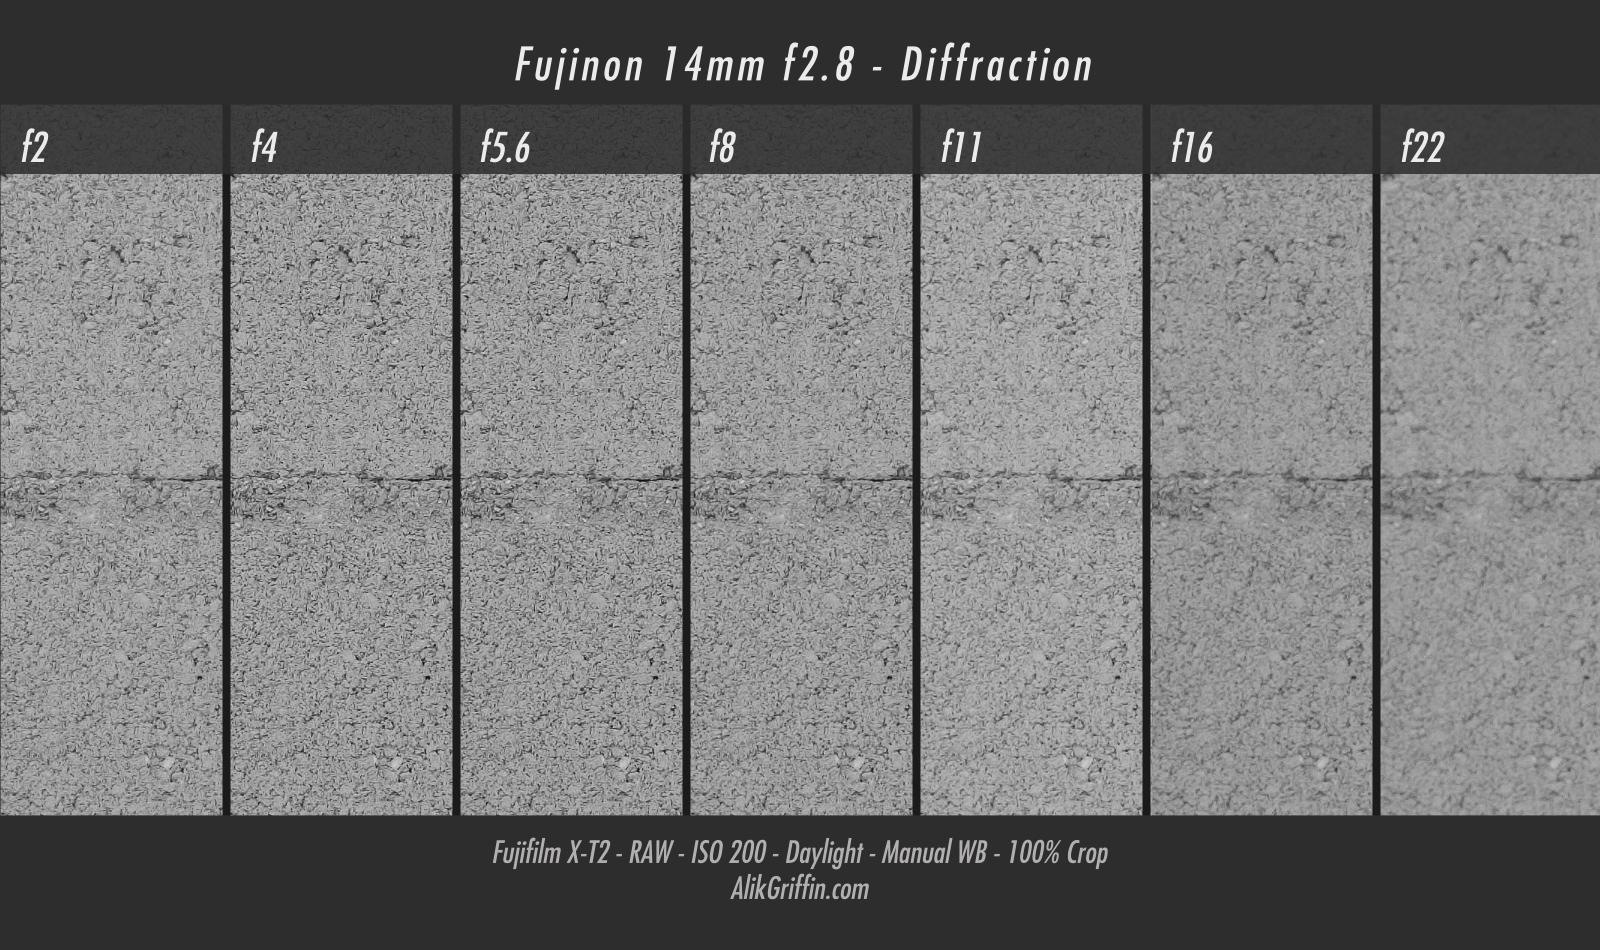 Fujinon 14mm f2.8 Diffraction & Sweet Spot Chart